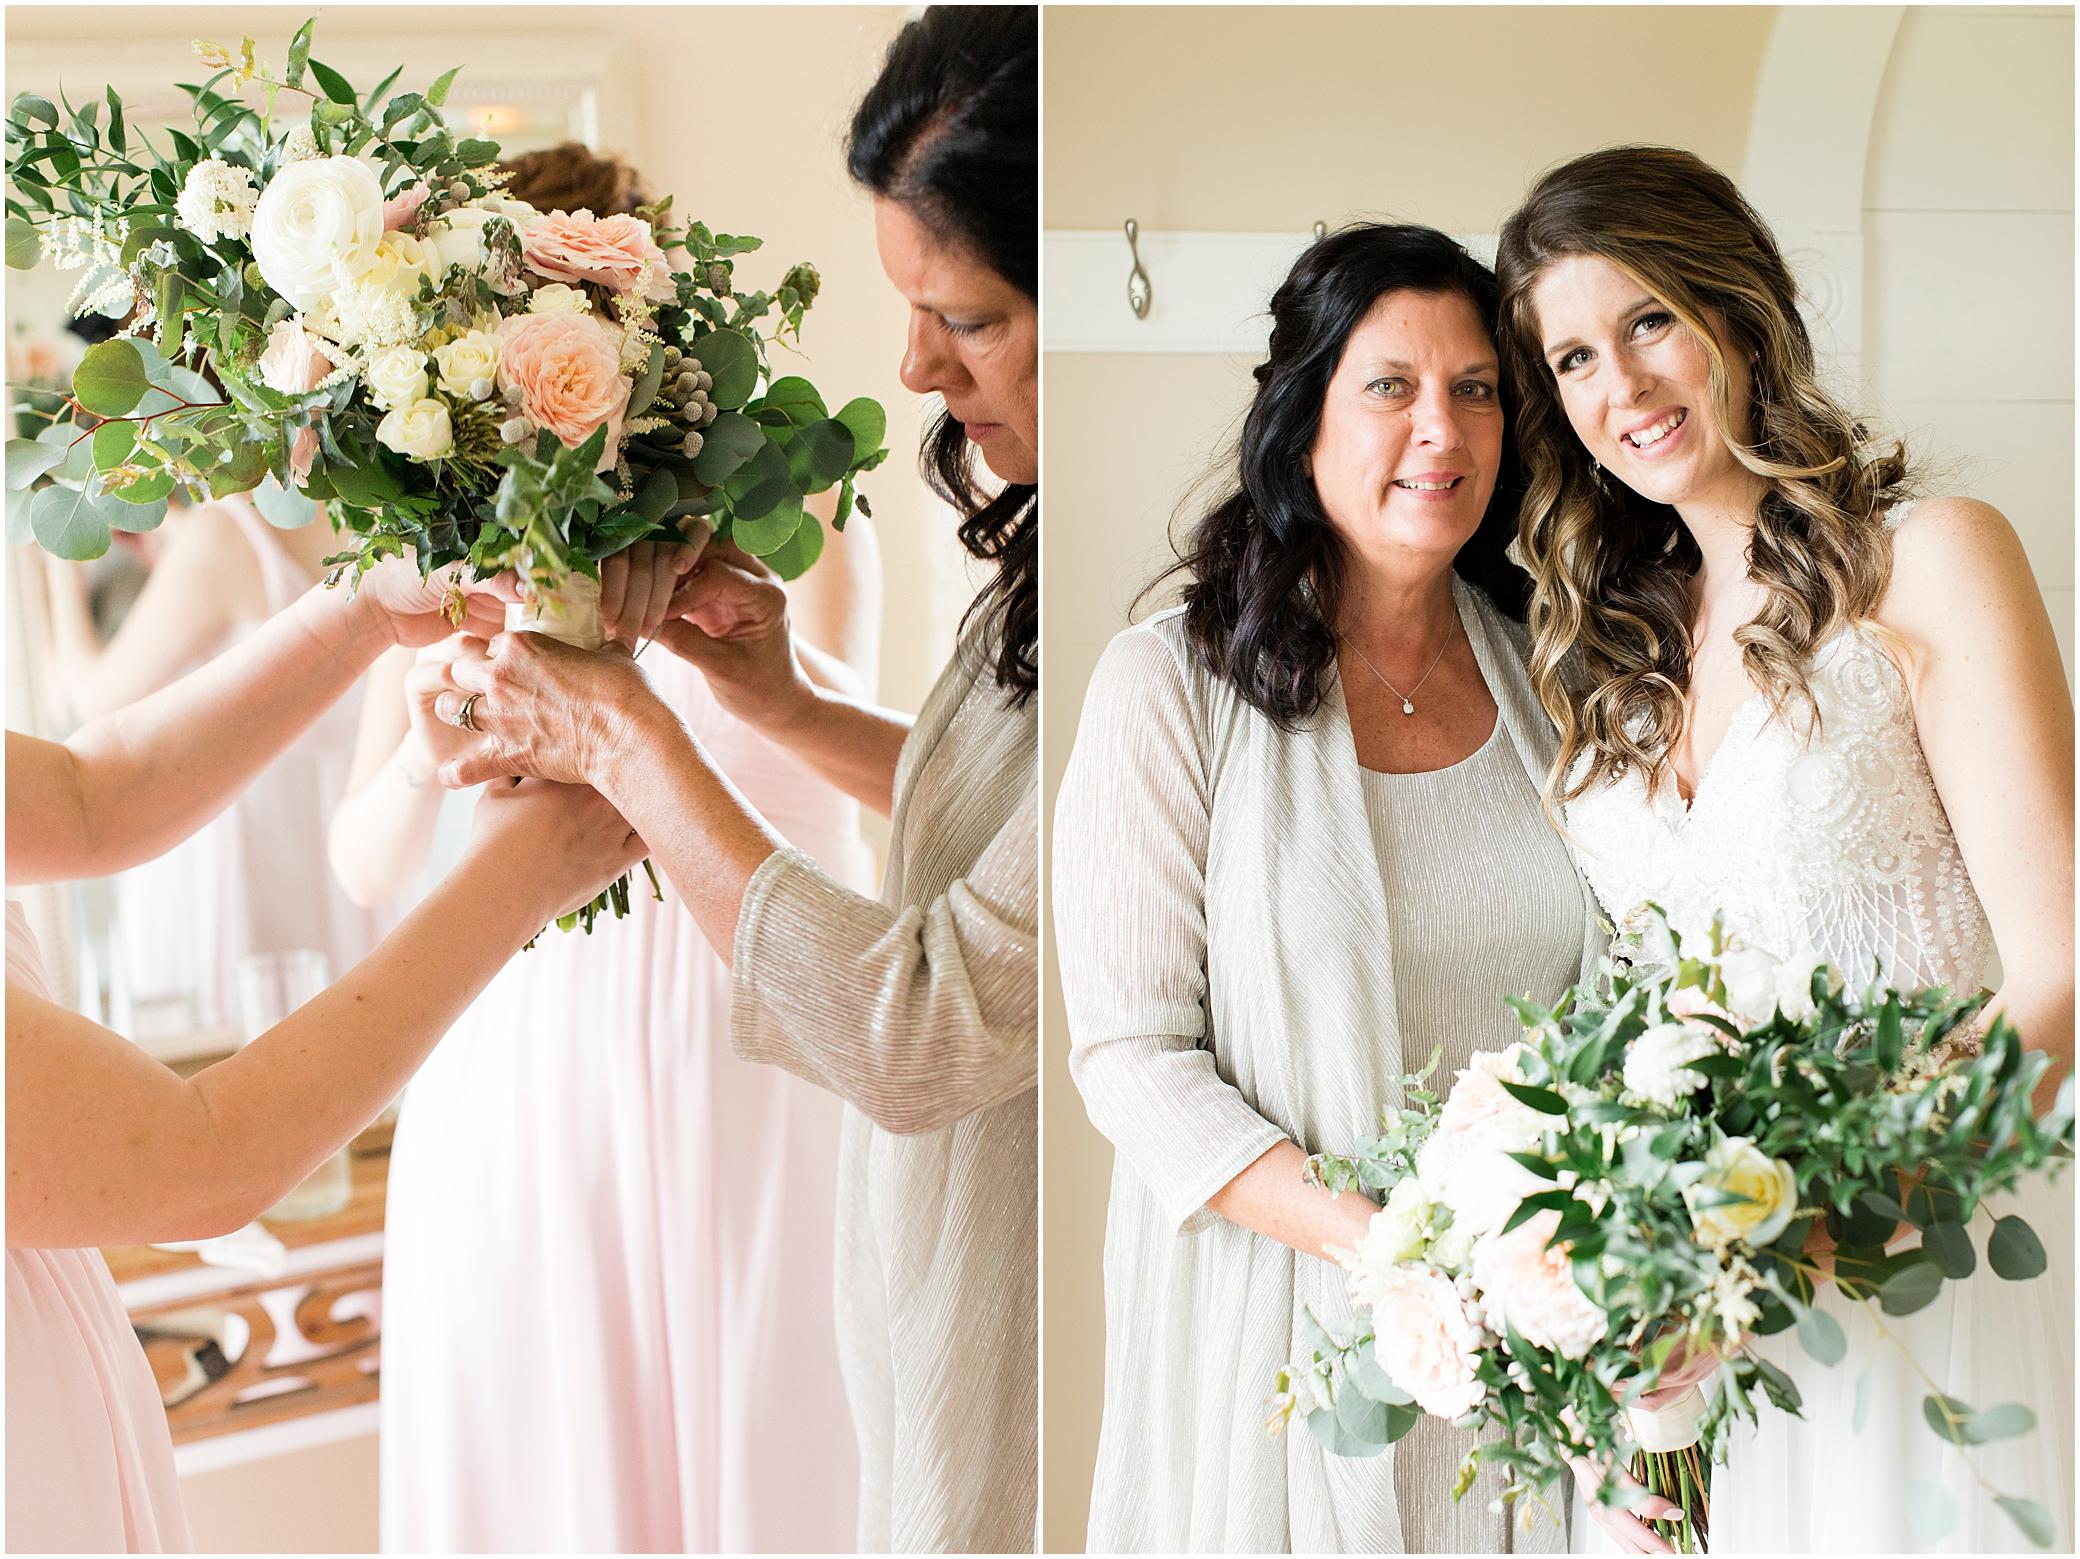 bridal portrait in the bridal suite at sierra vista wedding venue, bloom by doyle's bouquet